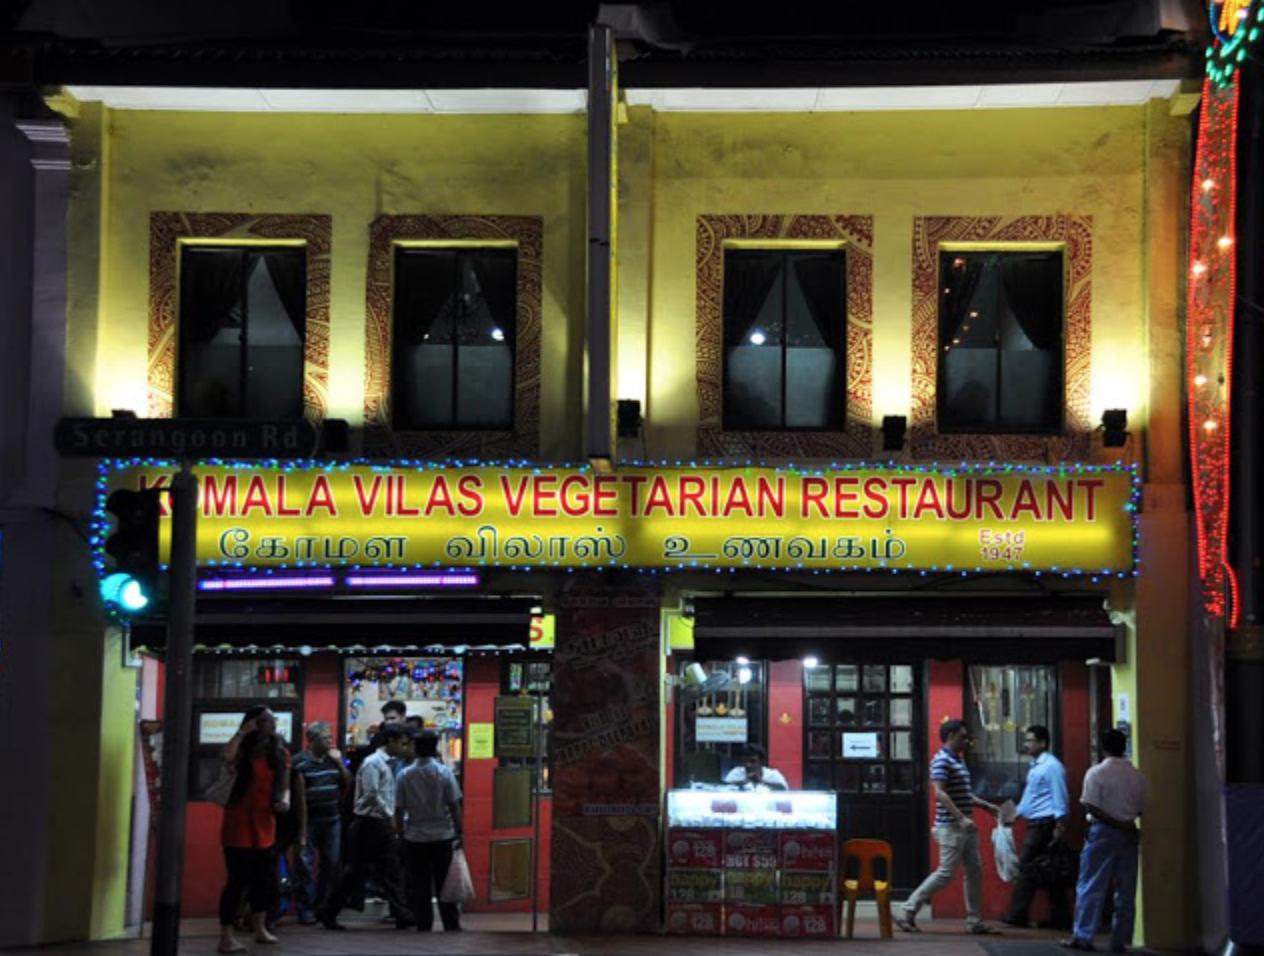 Hotspots-for-vegetarians-venuerific-singapore-komala-vilas-restaurant